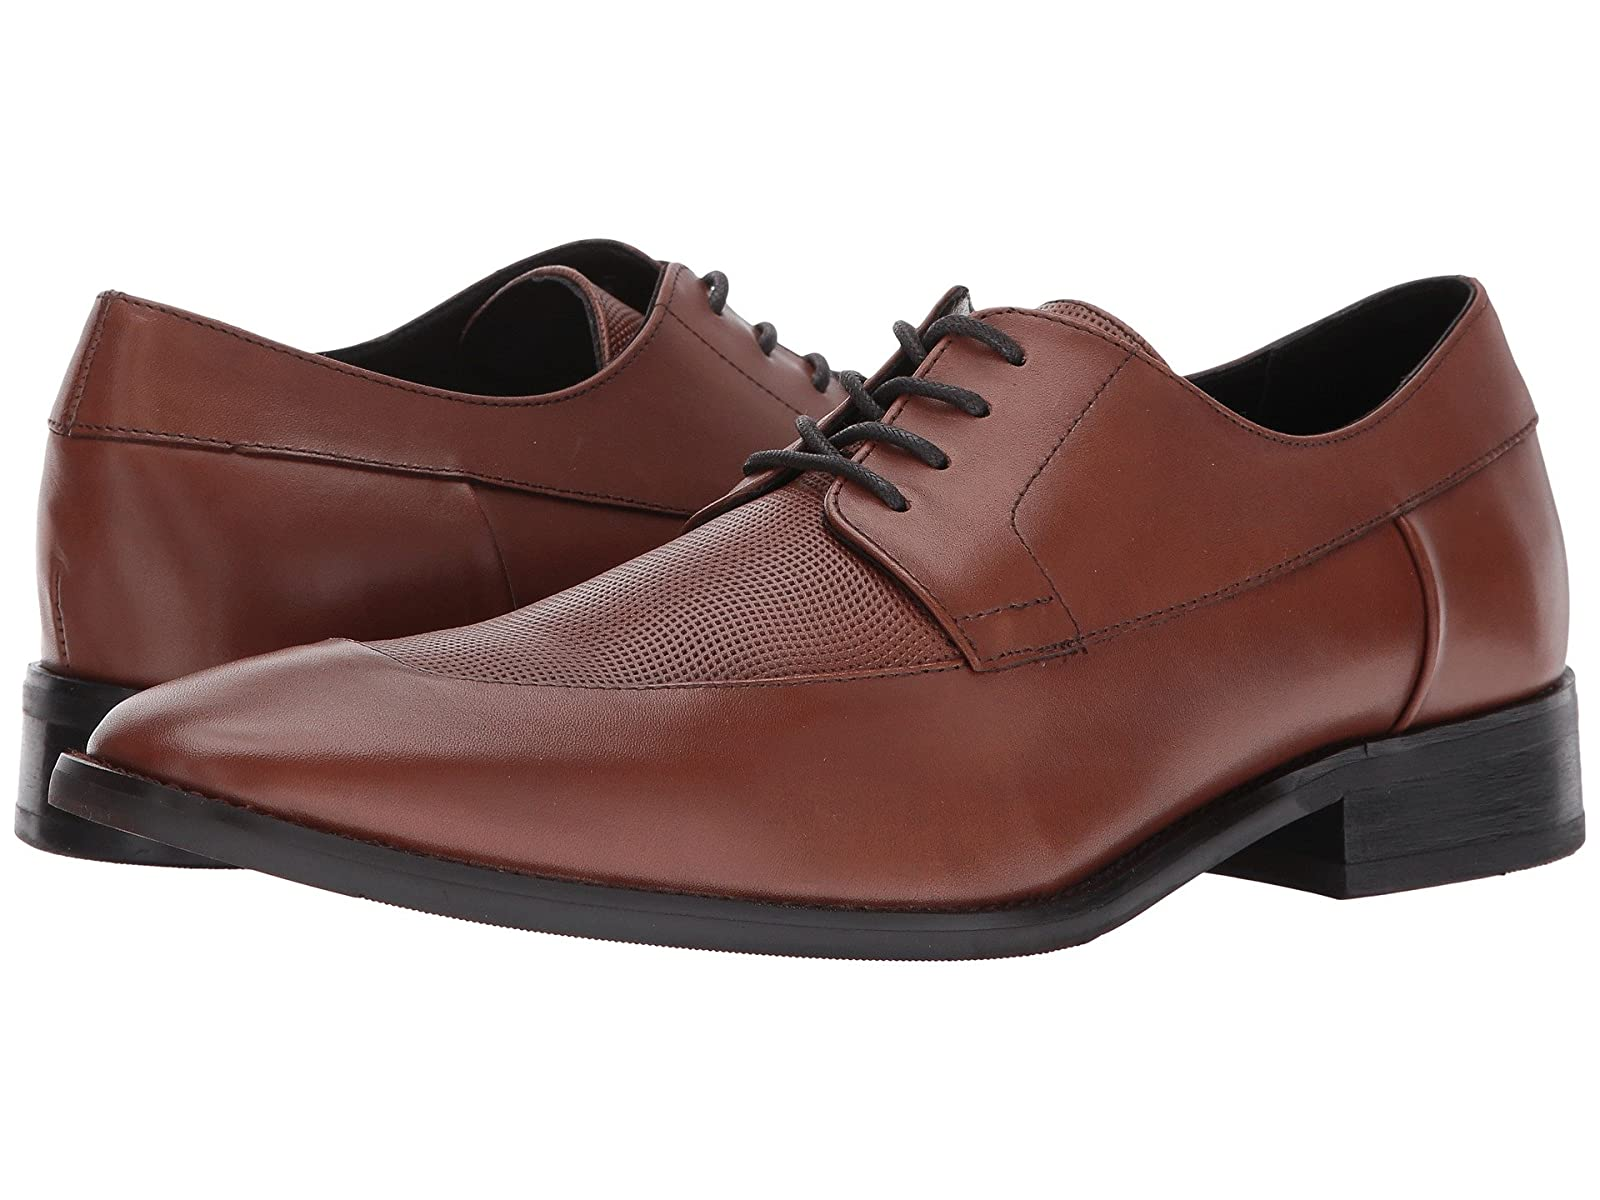 Calvin Klein RambertCheap and distinctive eye-catching shoes